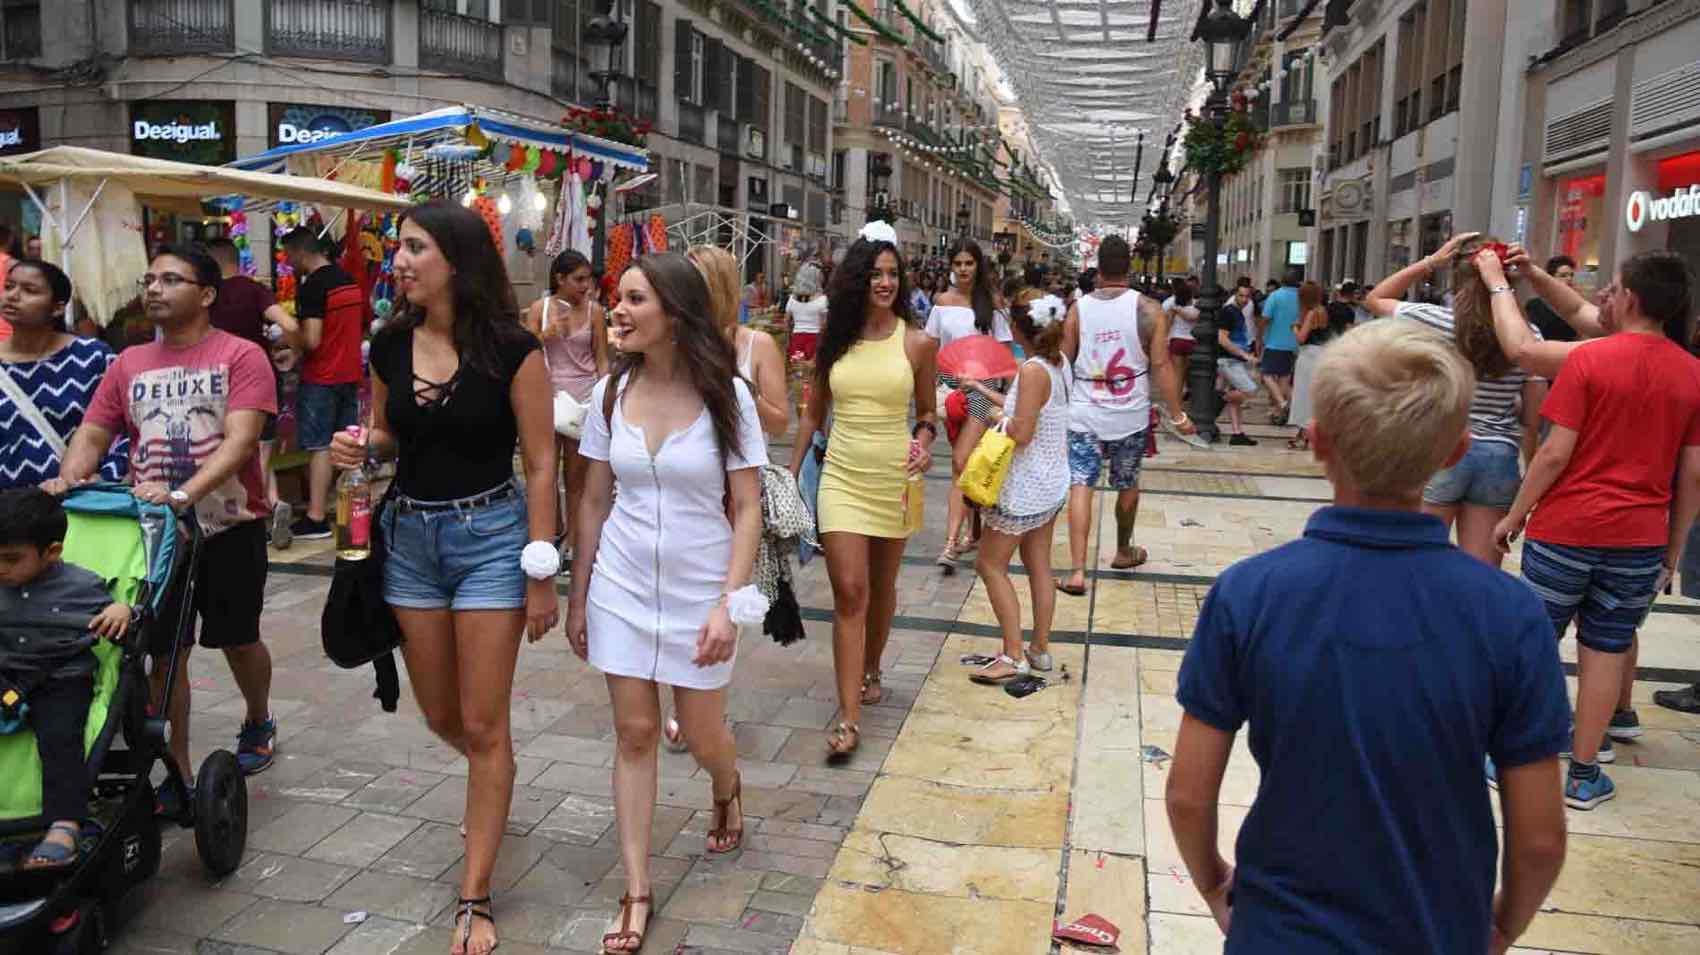 The beautiful people walks the elegant street of Calle Larios in Malaga